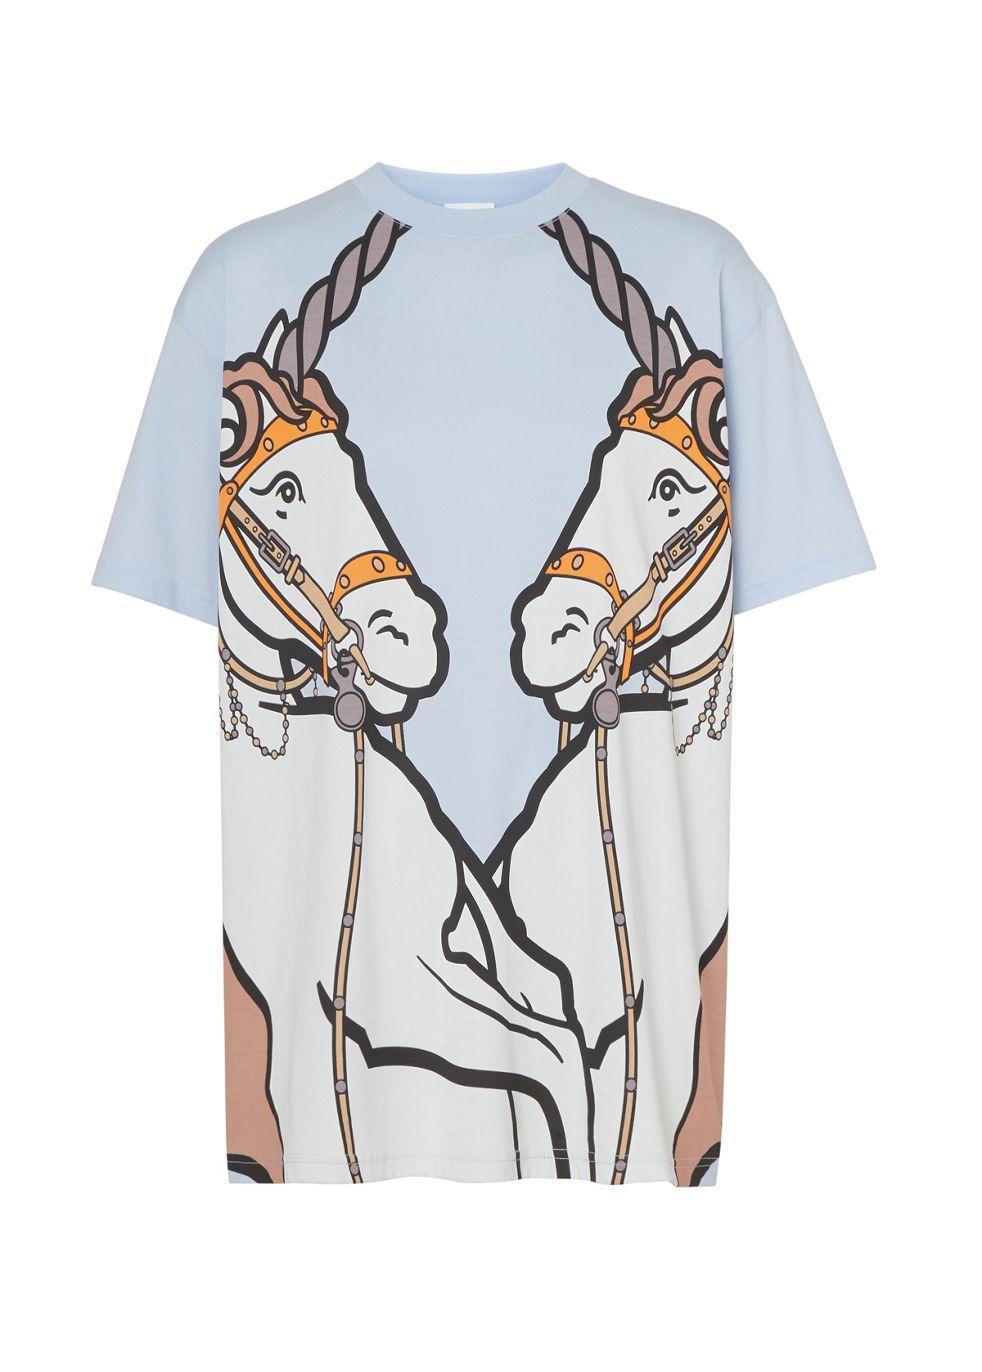 BURBERRY | Burberry Unicorn Print Cotton Oversized T-Shirt | Goxip